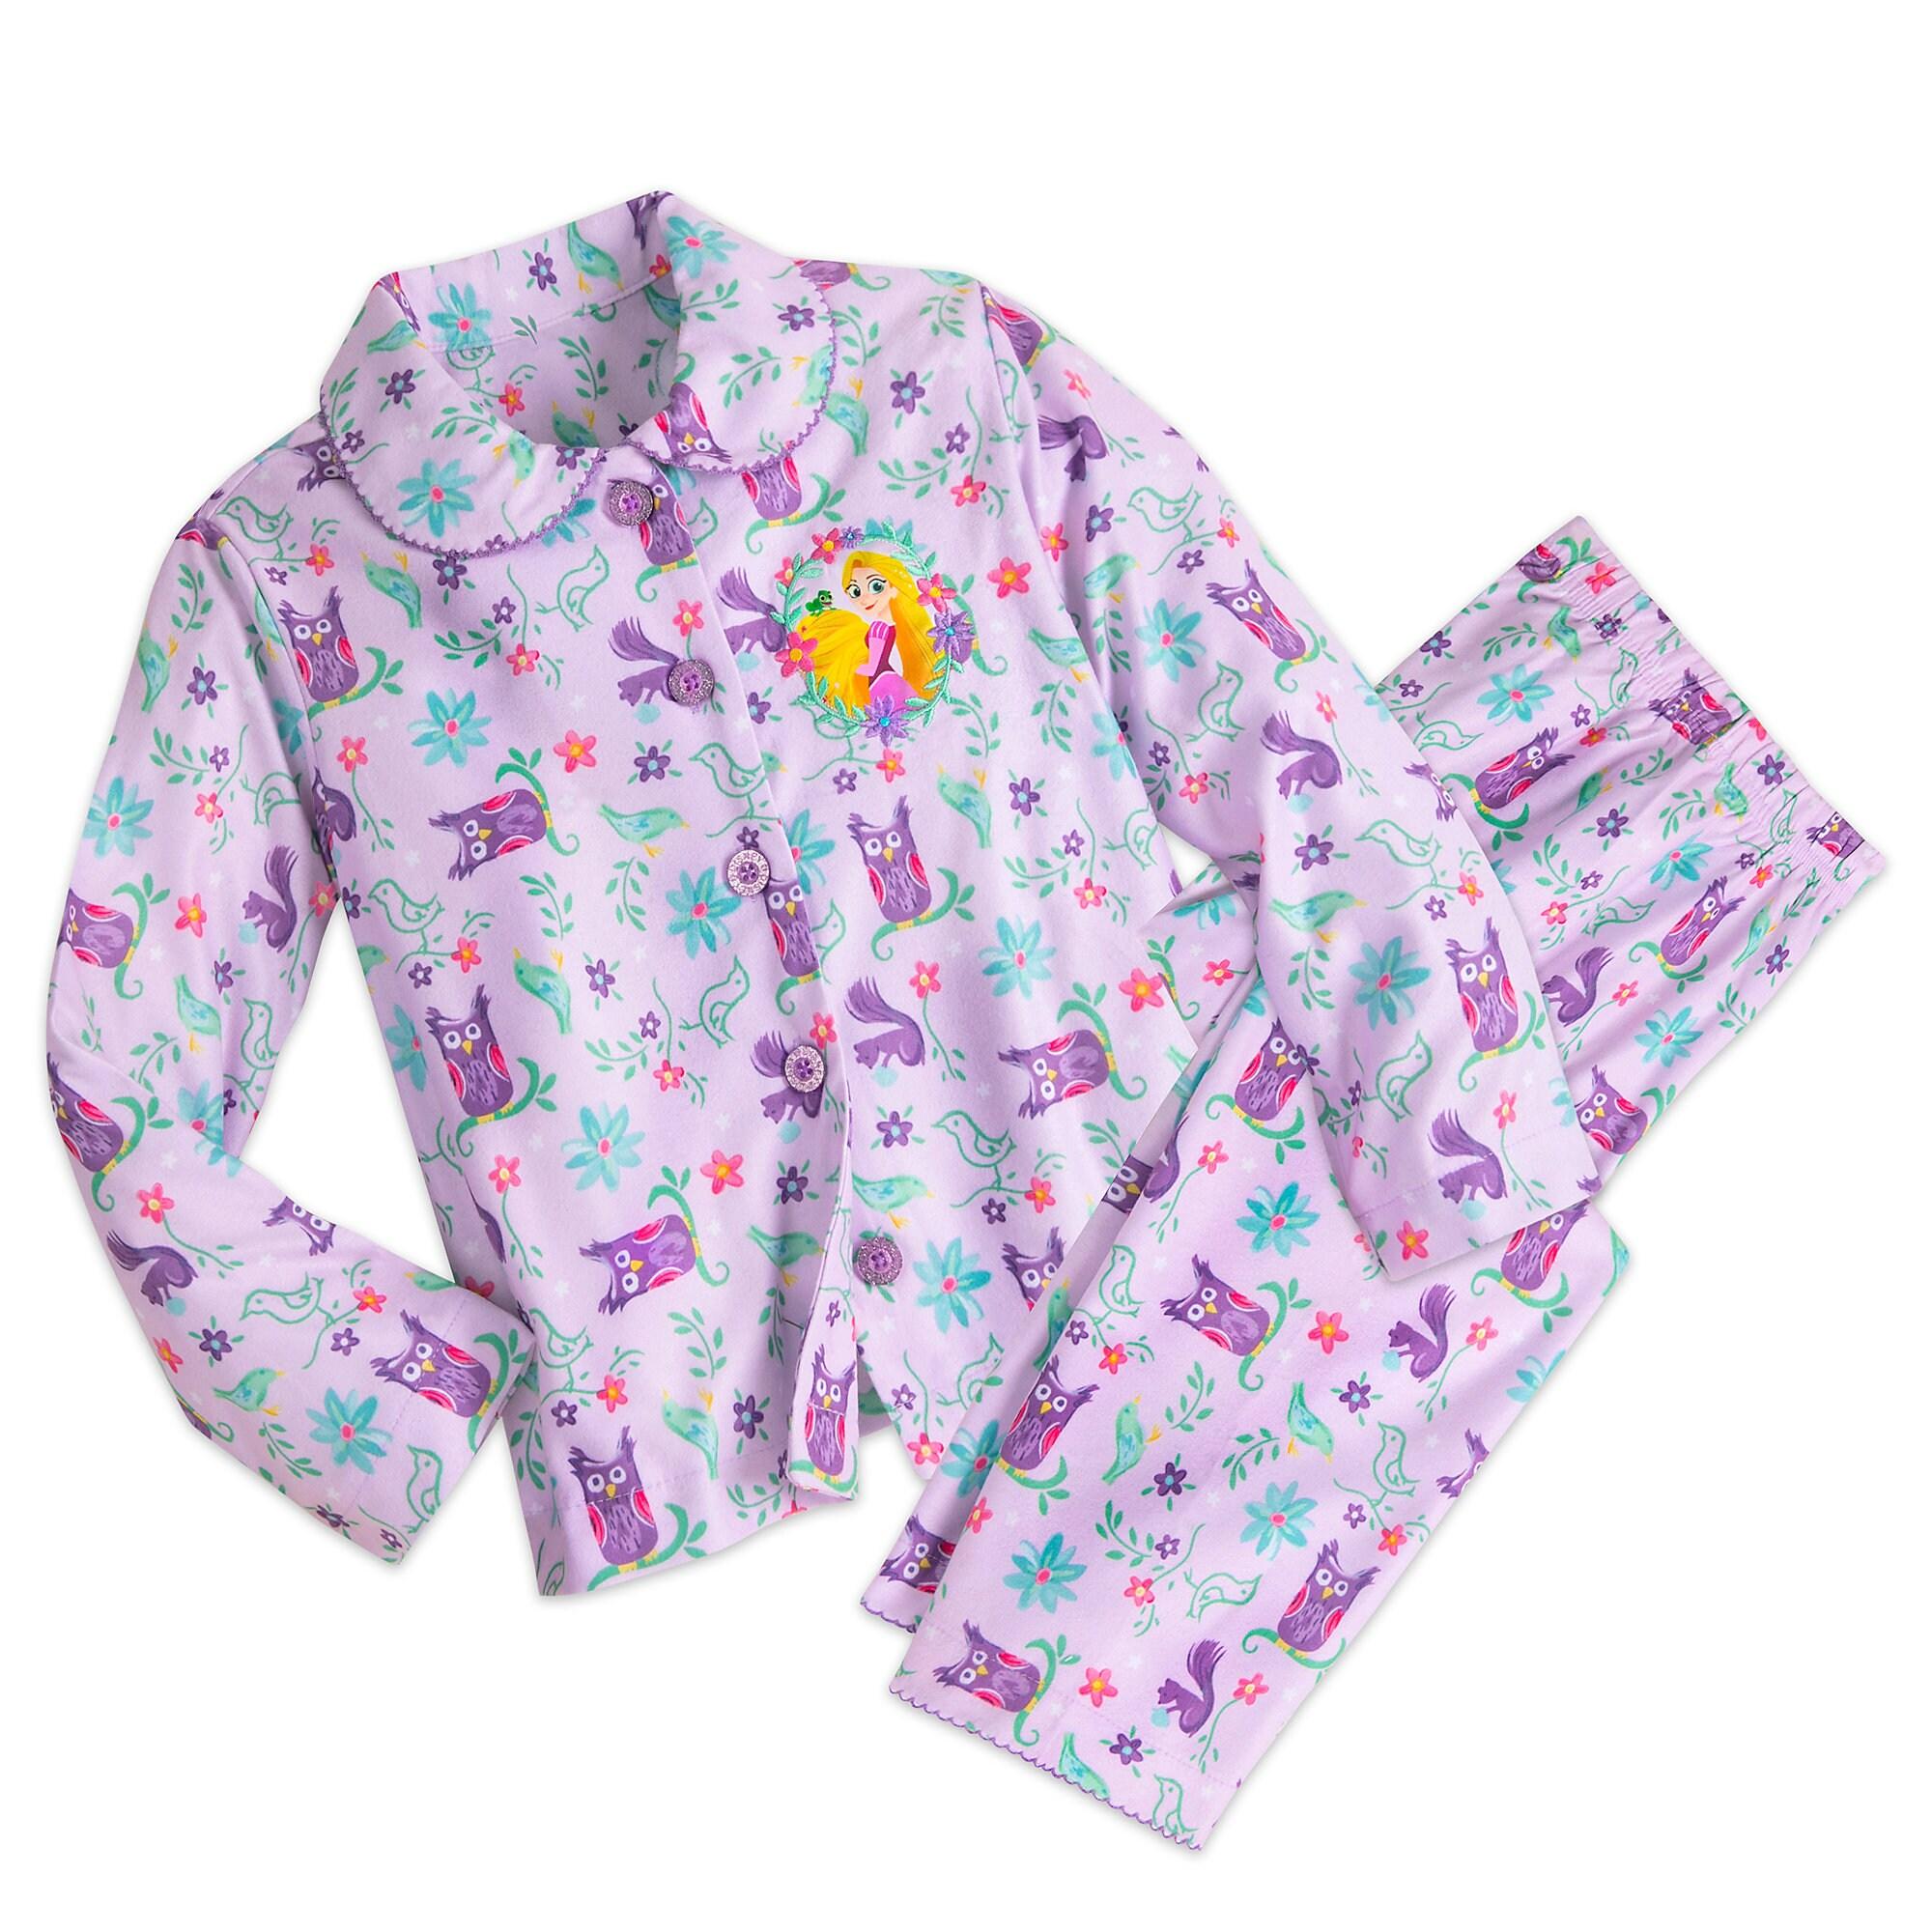 Tangled Flannel PJ Set for Girls